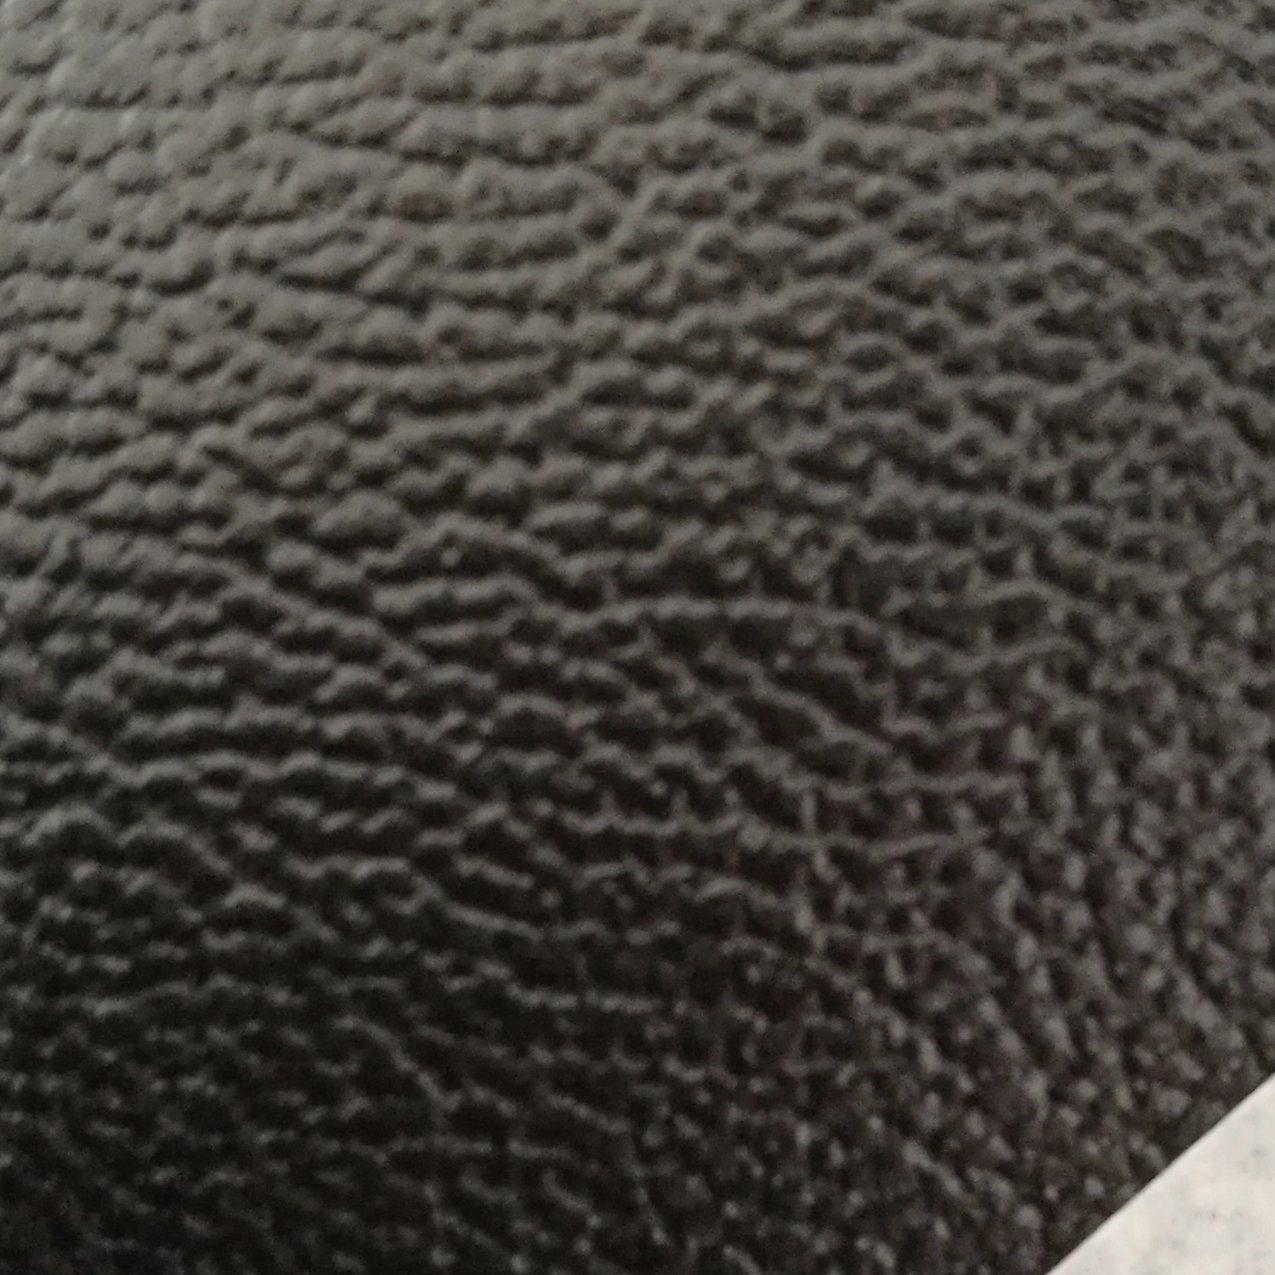 SGS International Gold Medal Z037leather Upholstery Leather Upholstery Leather PVC Leather